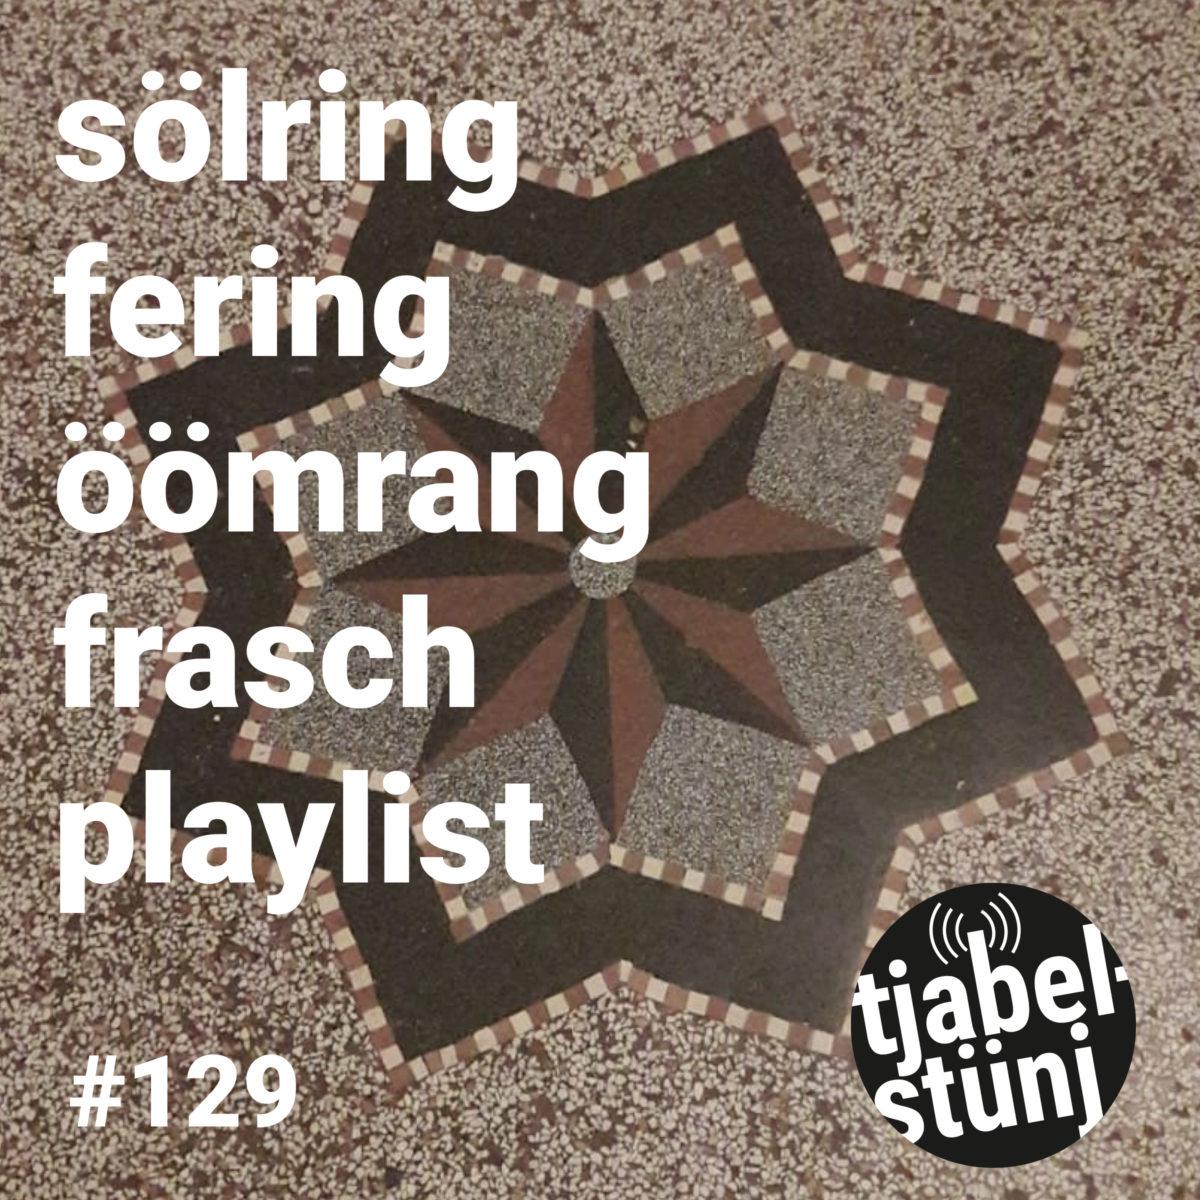 Playlist #129